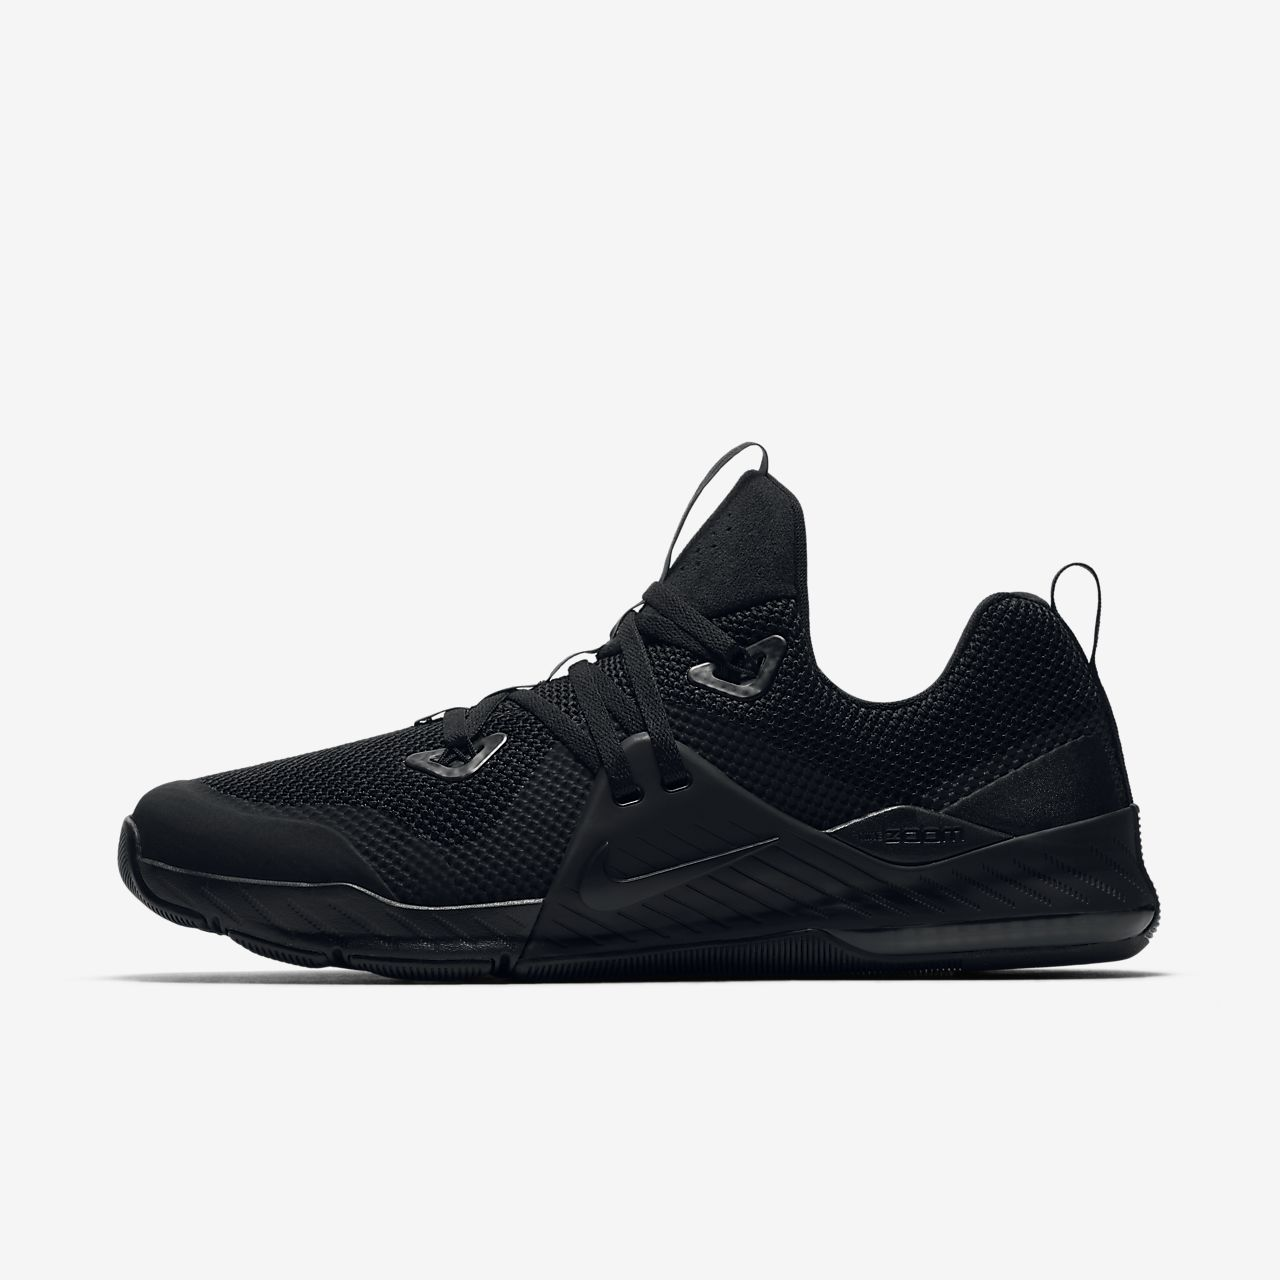 Nike Zoom Train Command Men's Gym/Boxing Shoe